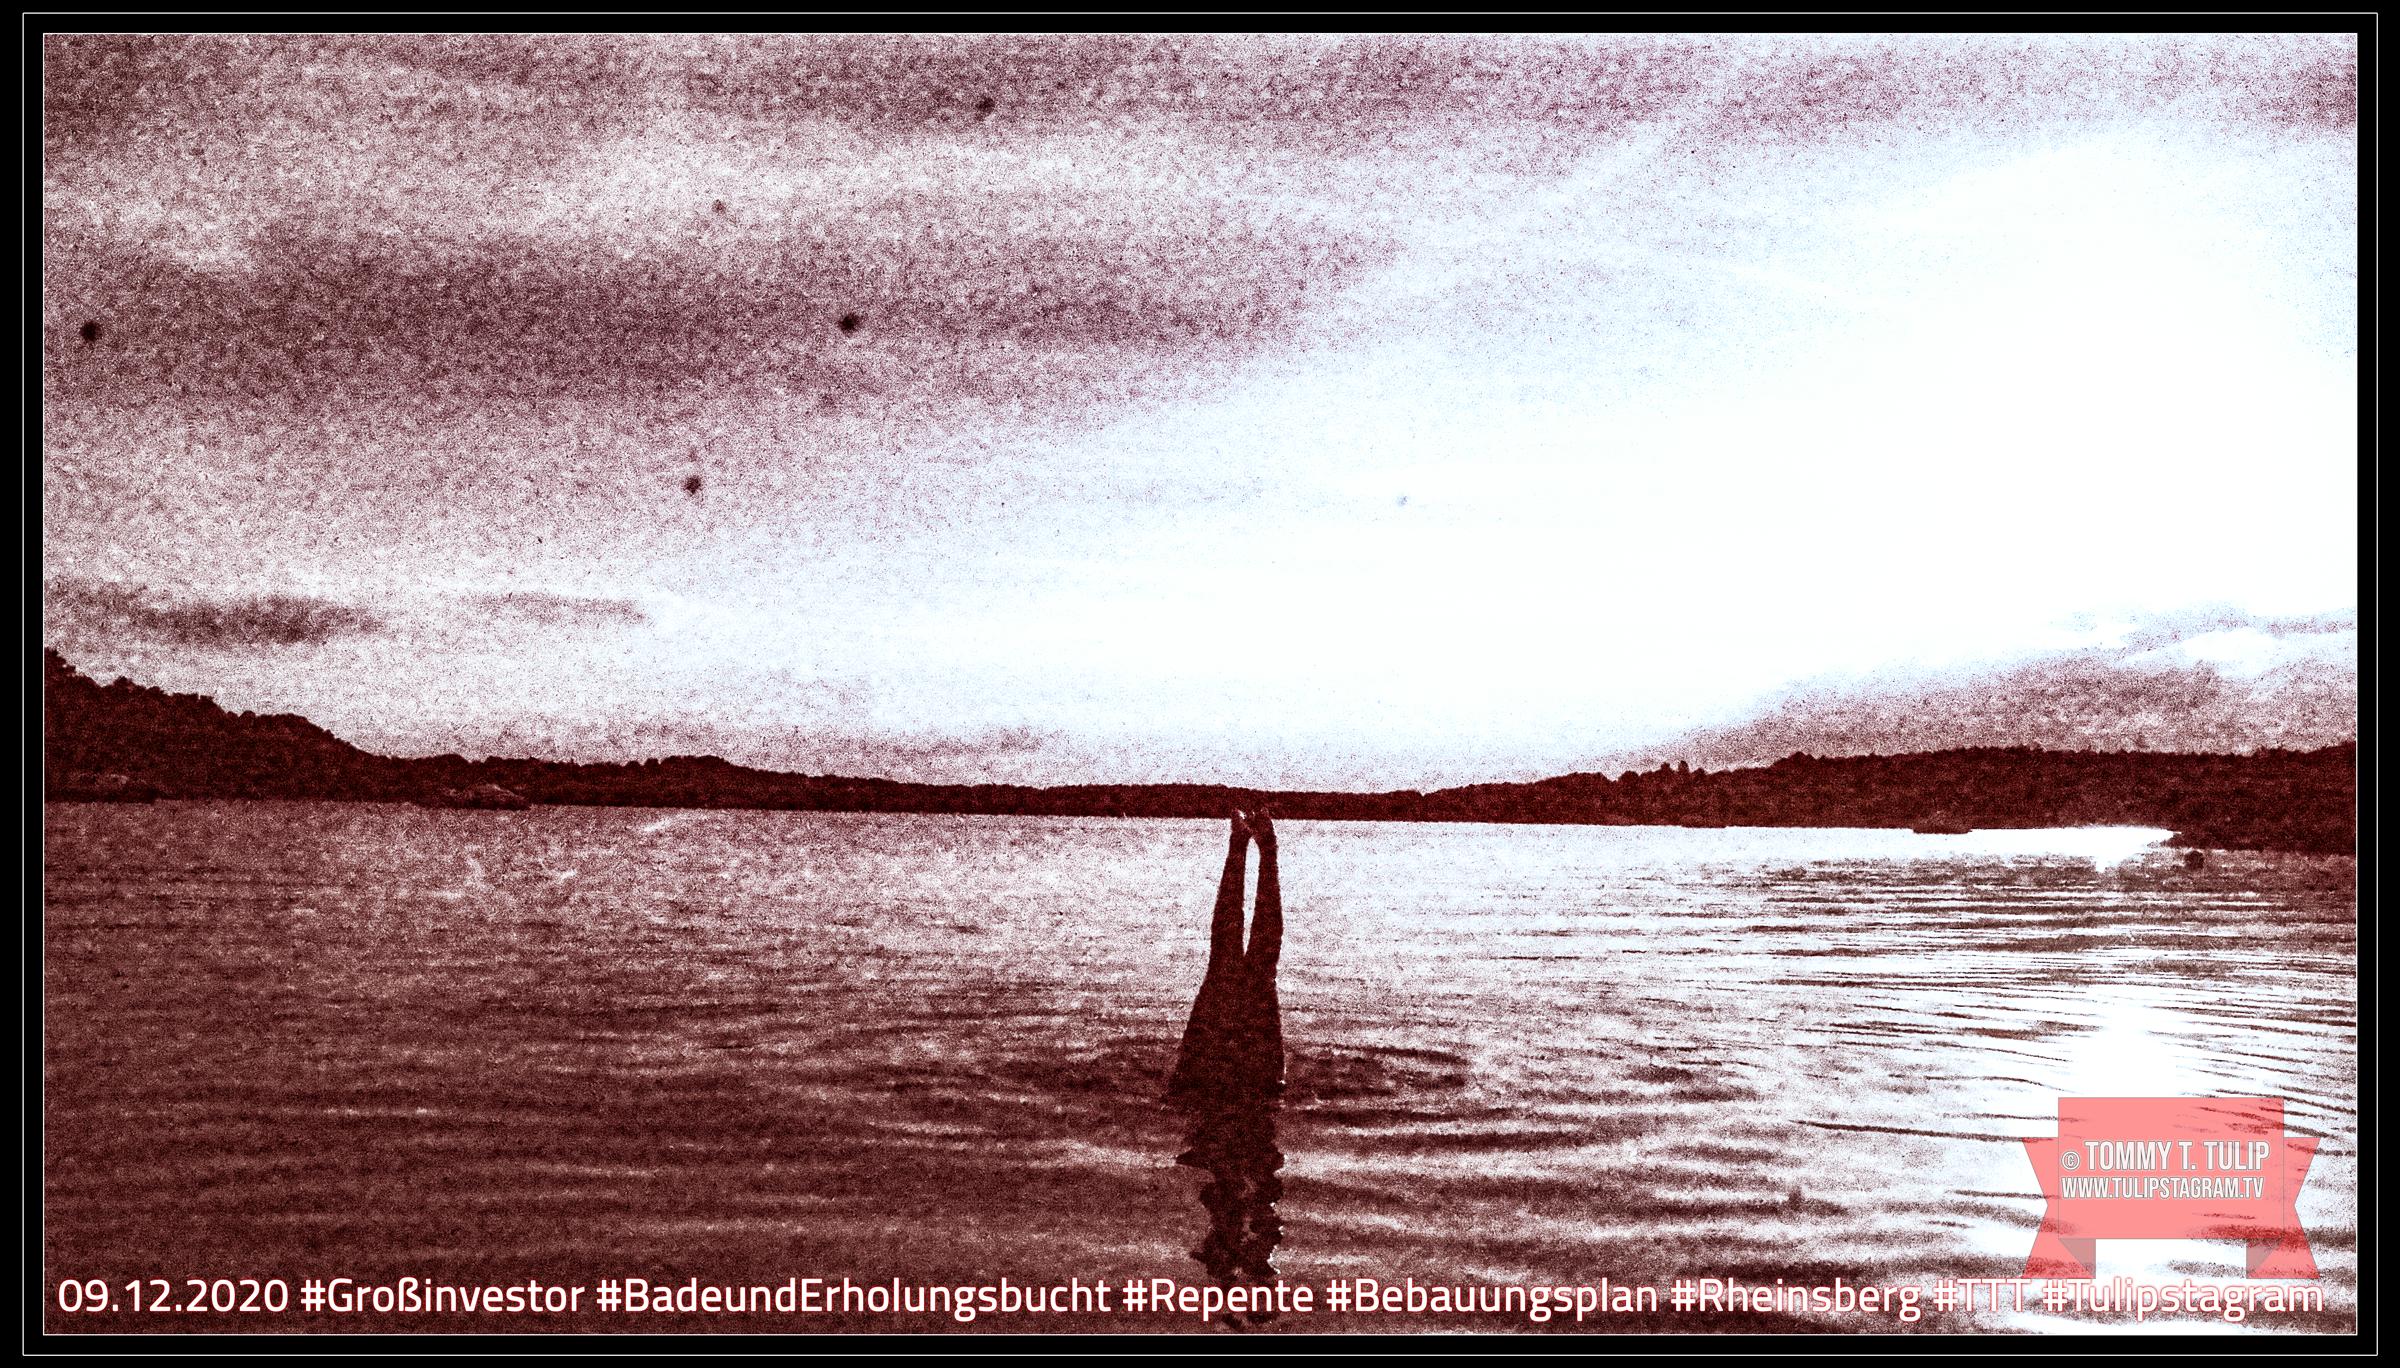 09.12.2020 #Großinvestor #BadeundErholungsbucht #Repente #Bebauungsplan #Rheinsberg #TTT #Tulipstagram